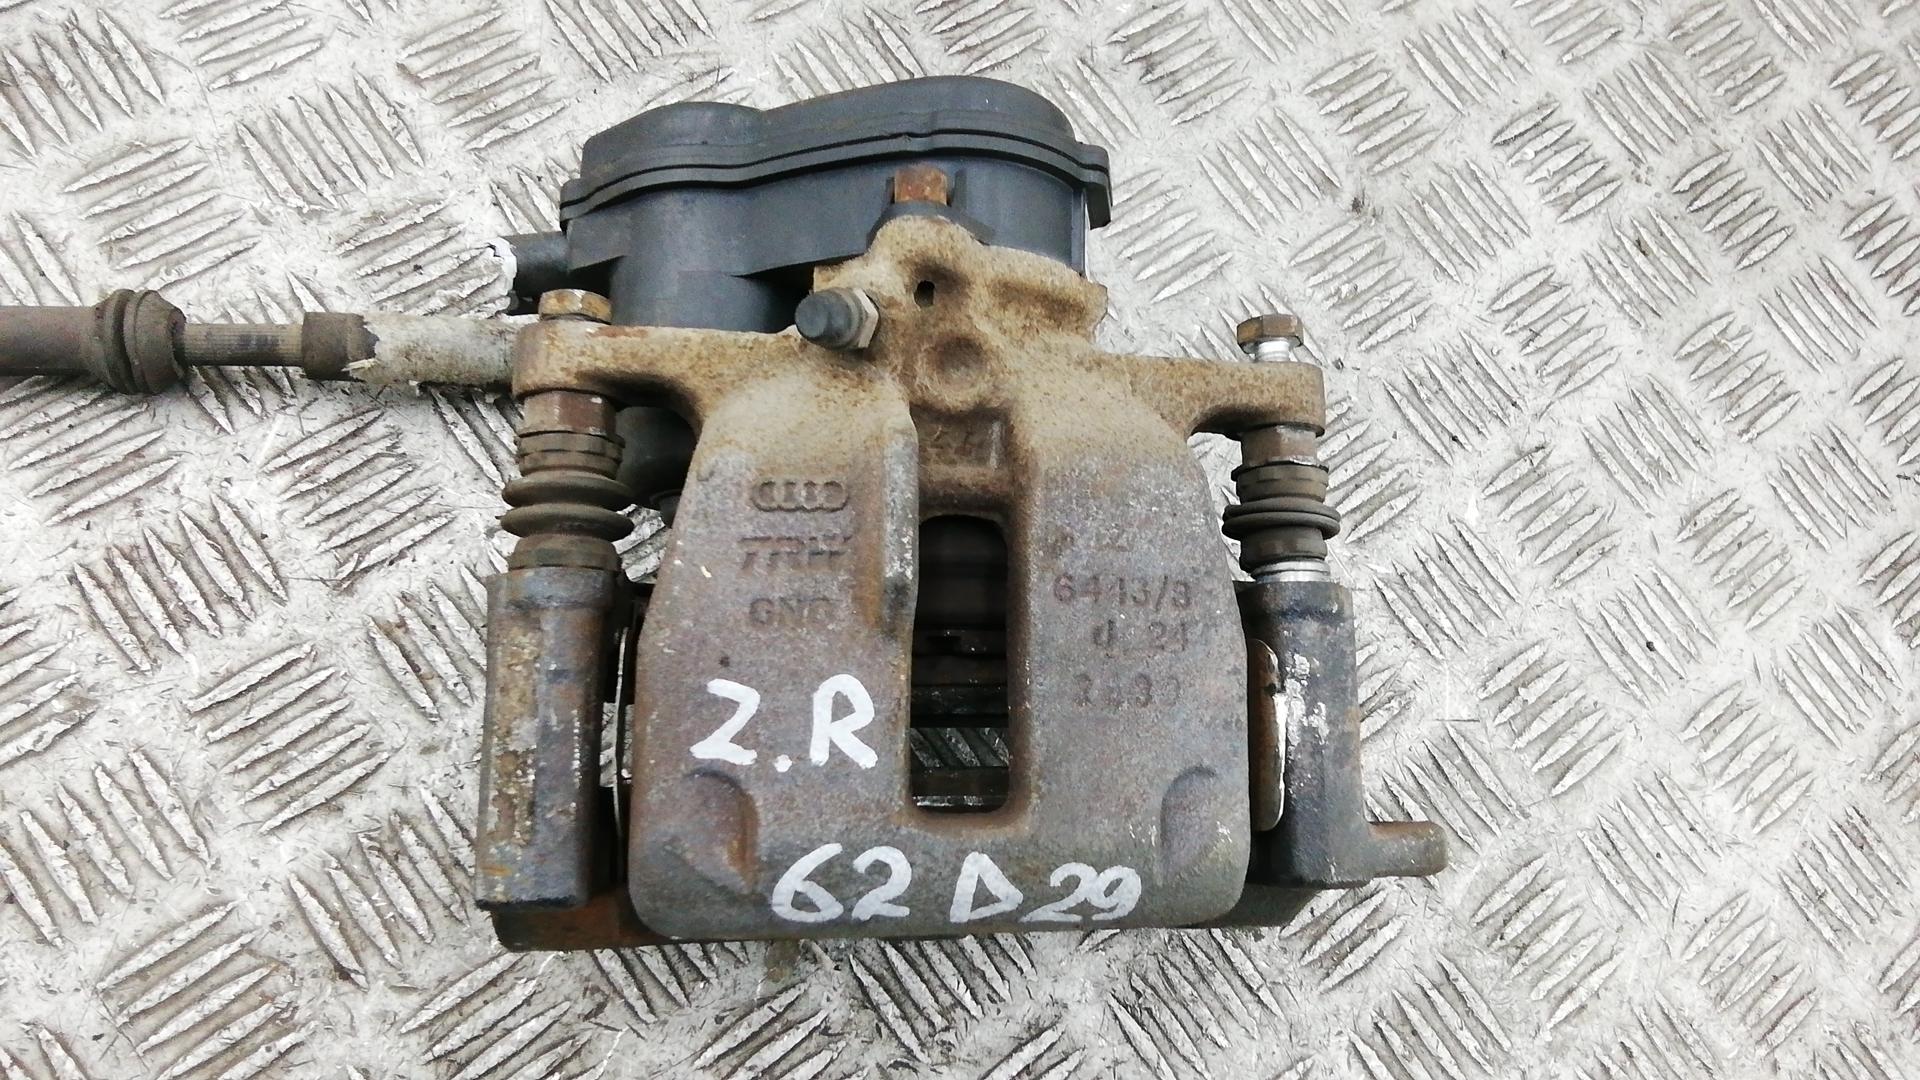 Суппорт тормозной задний правый, AUDI, A4 B8, 2013